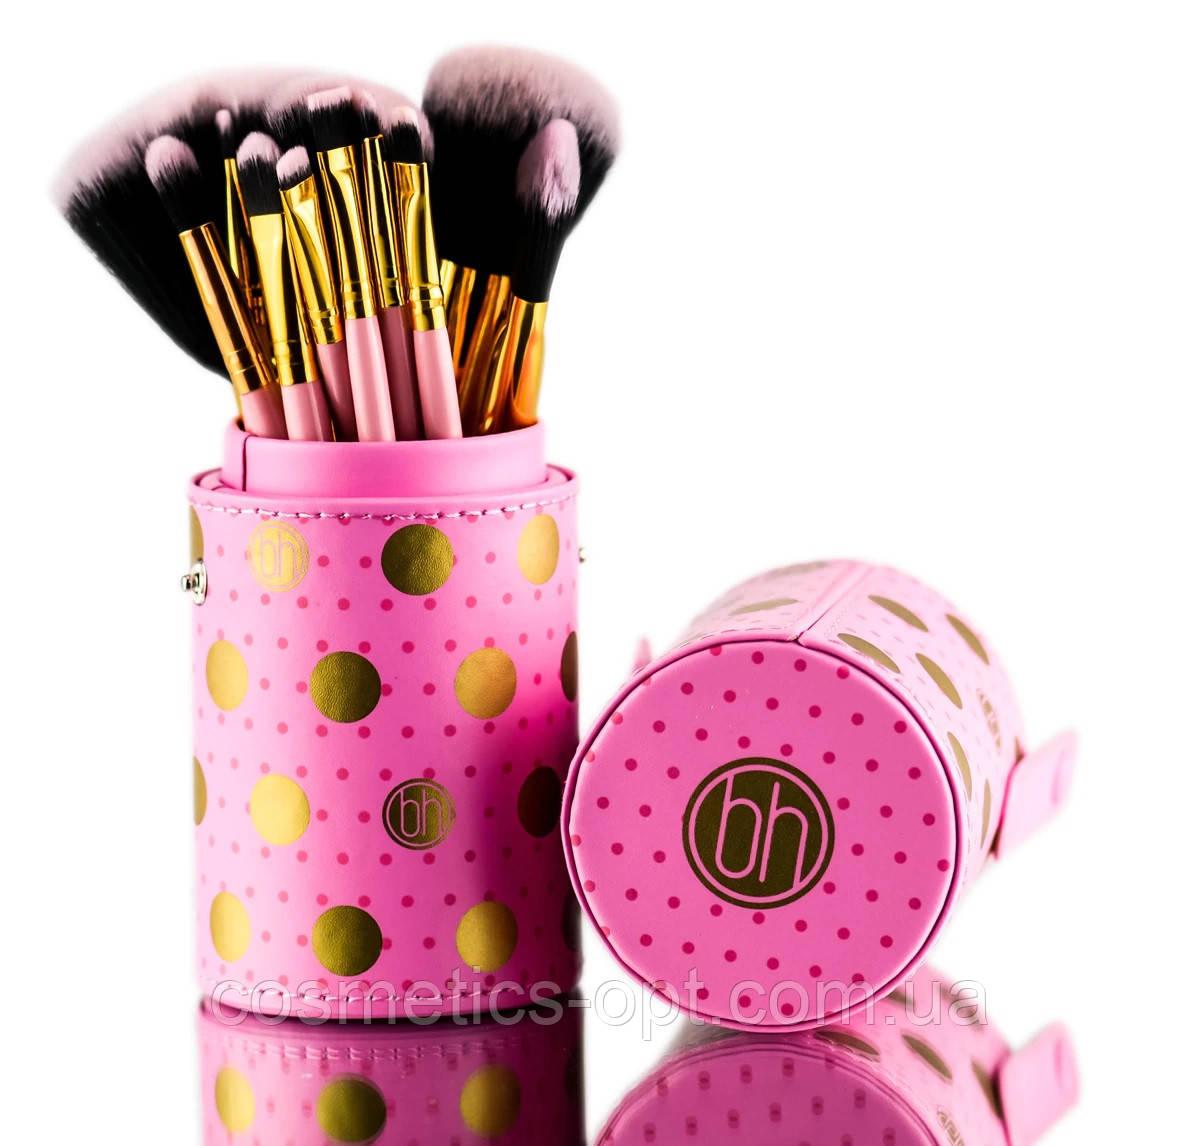 Кисти для макияжа в тубусе BH Cosmetics Dot Collection , 11 шт